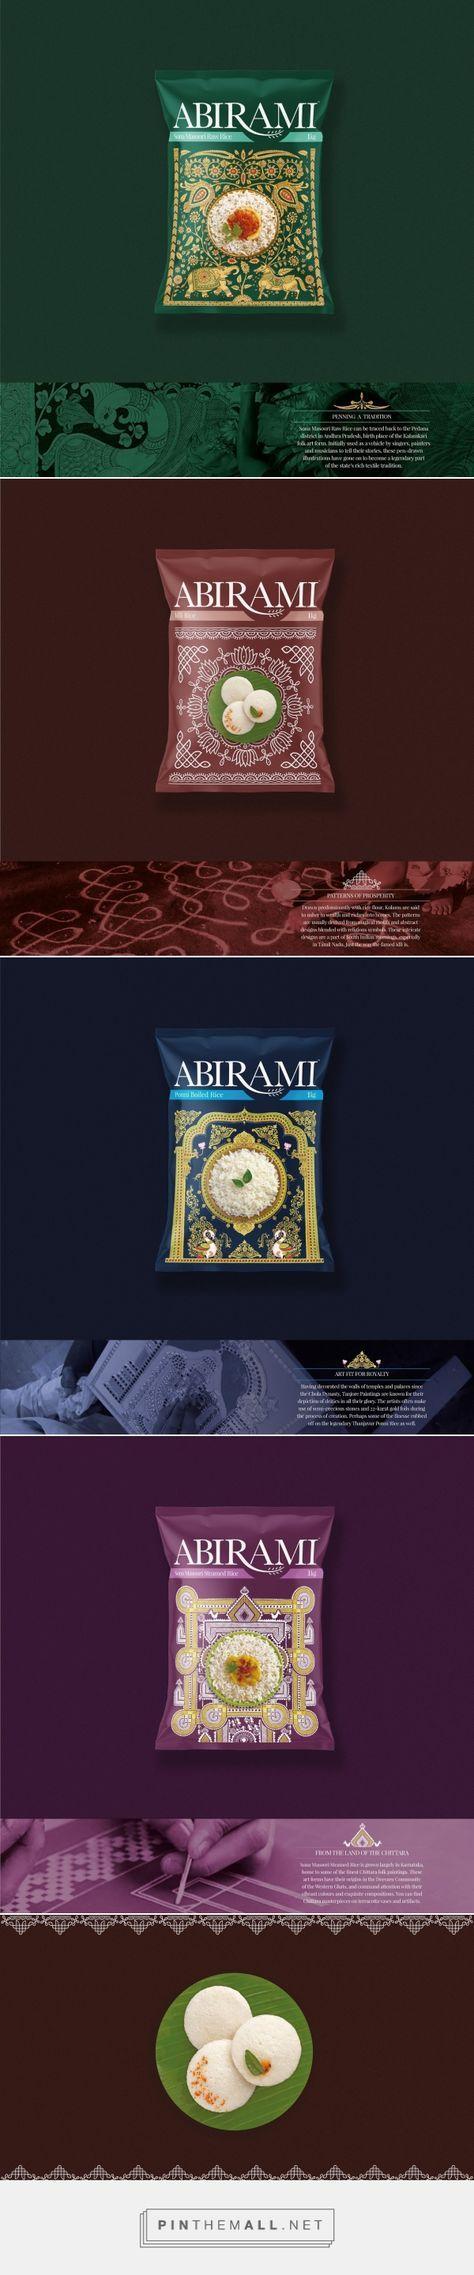 Abirami rice packaging design by Rubecon Communications - http://www.packagingoftheworld.com/2017/03/abirami.html